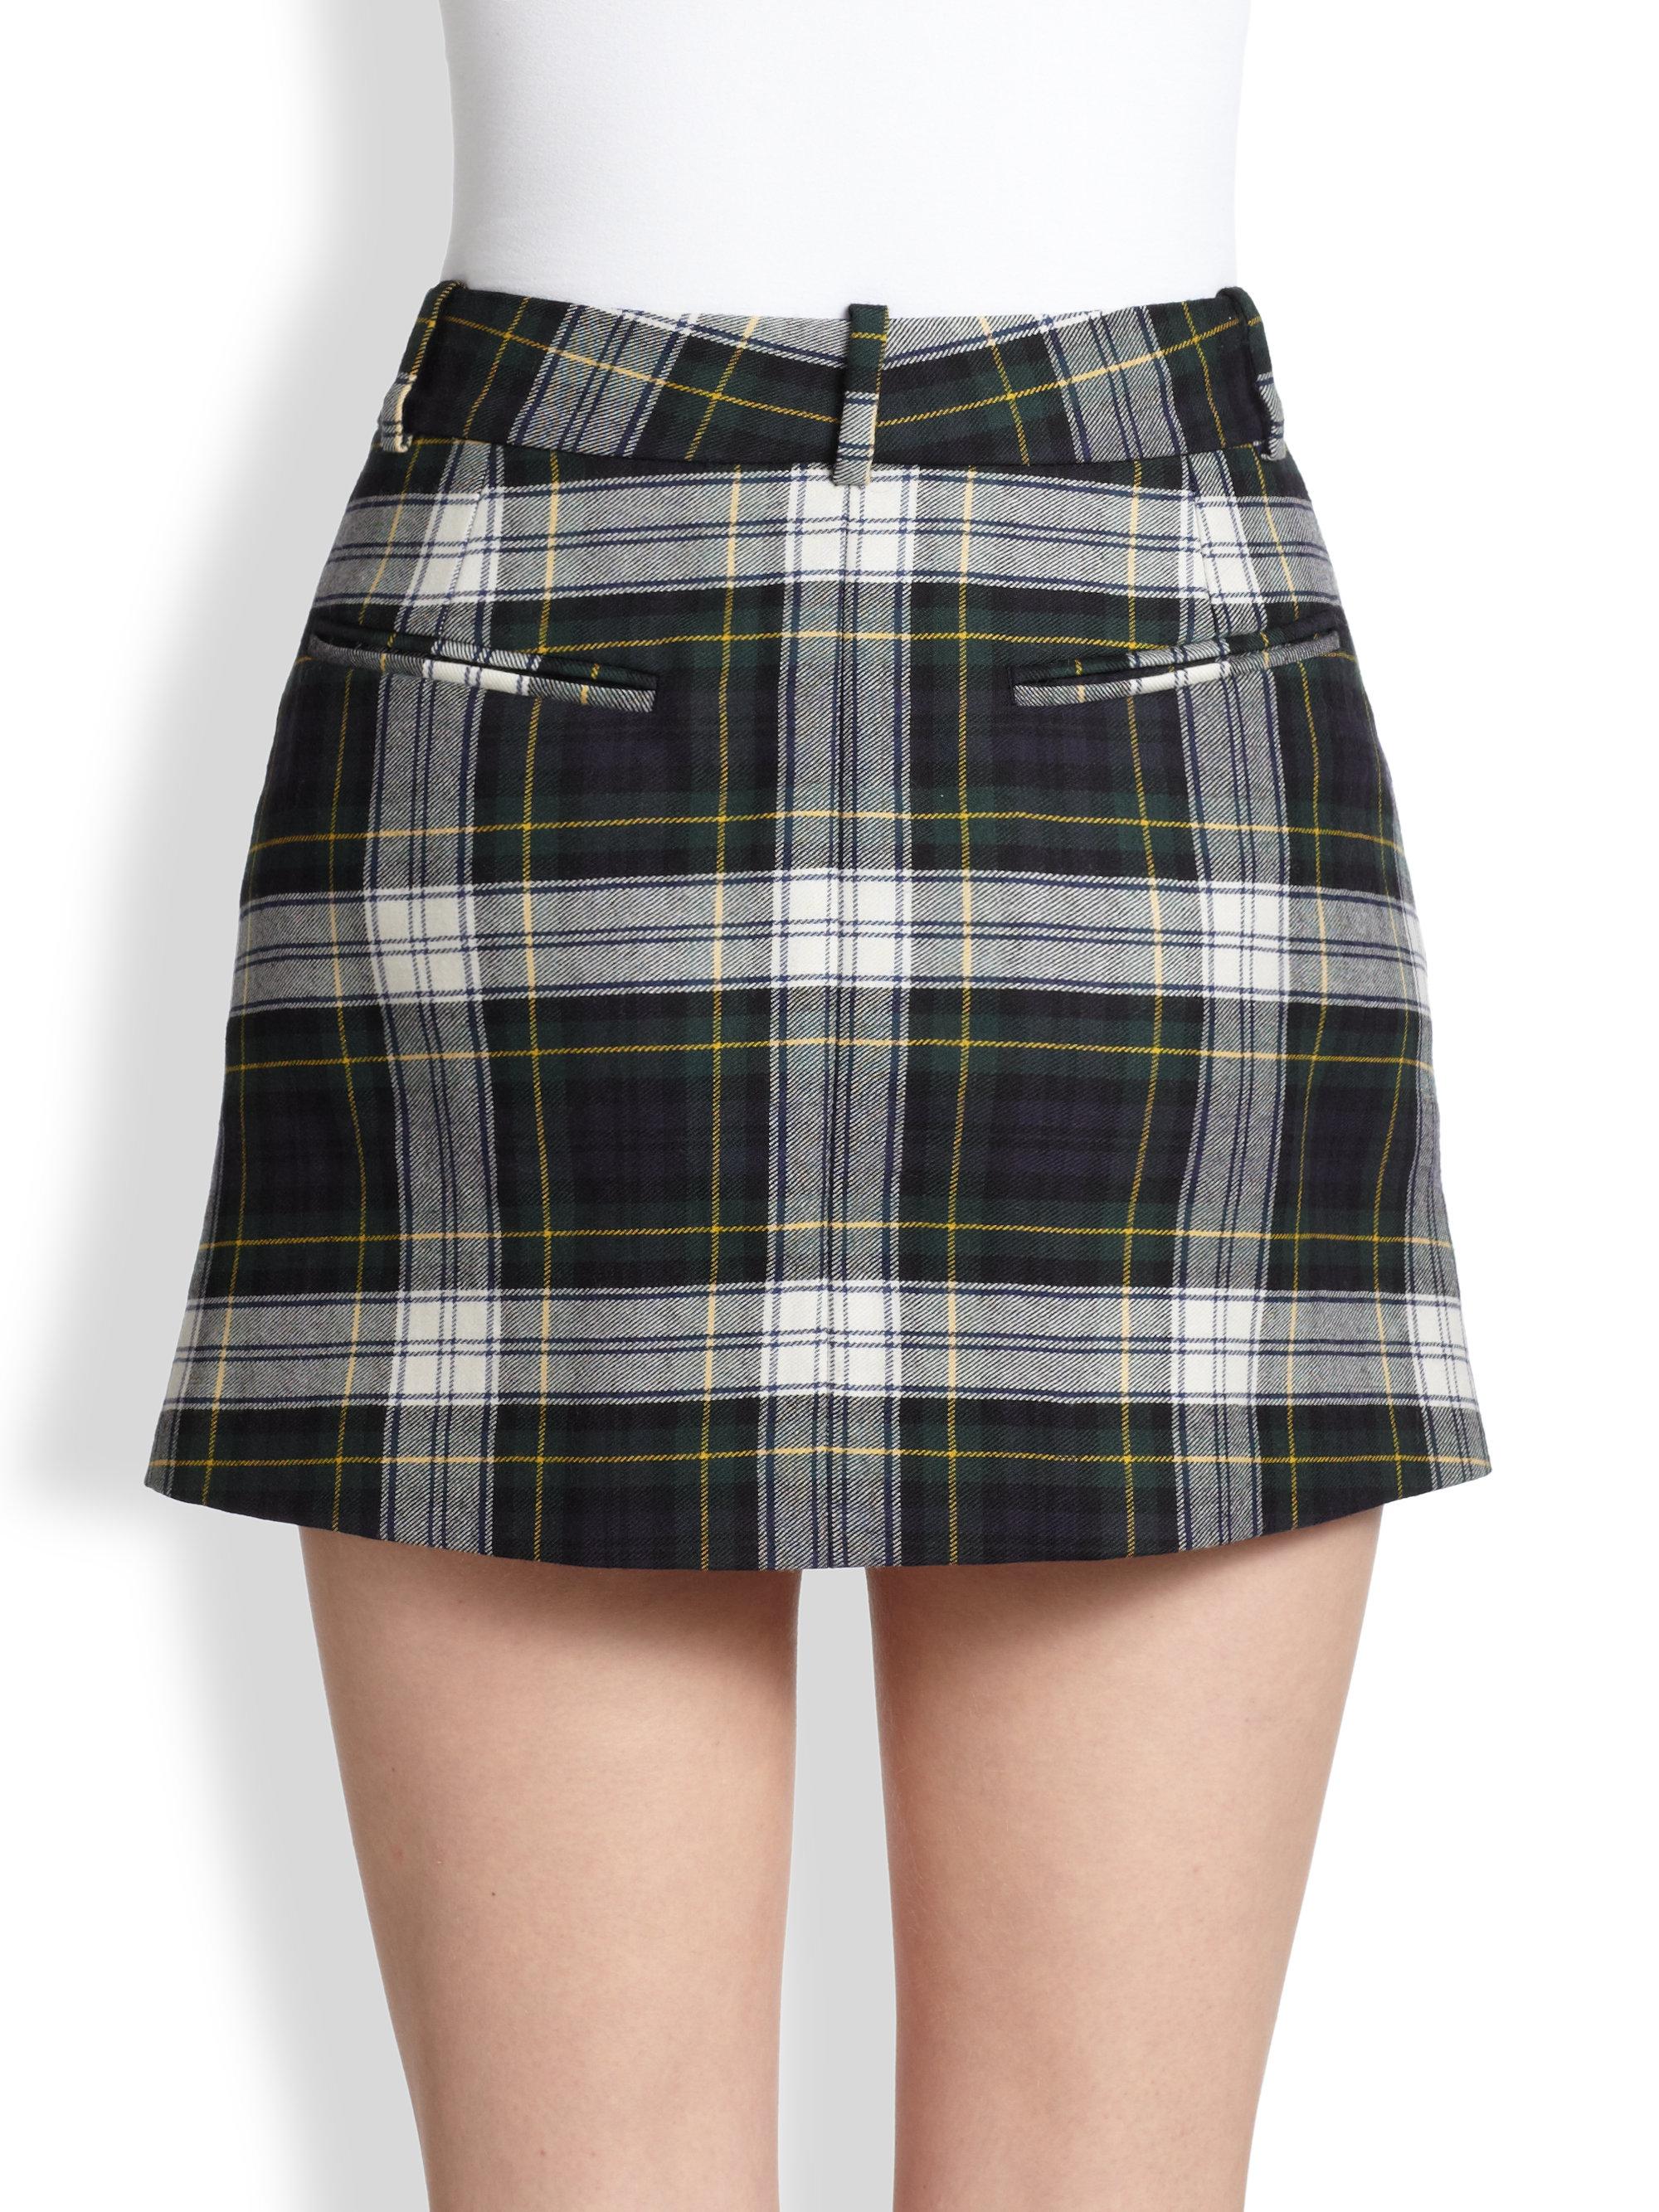 Wool Plaid Skirt - Skirts